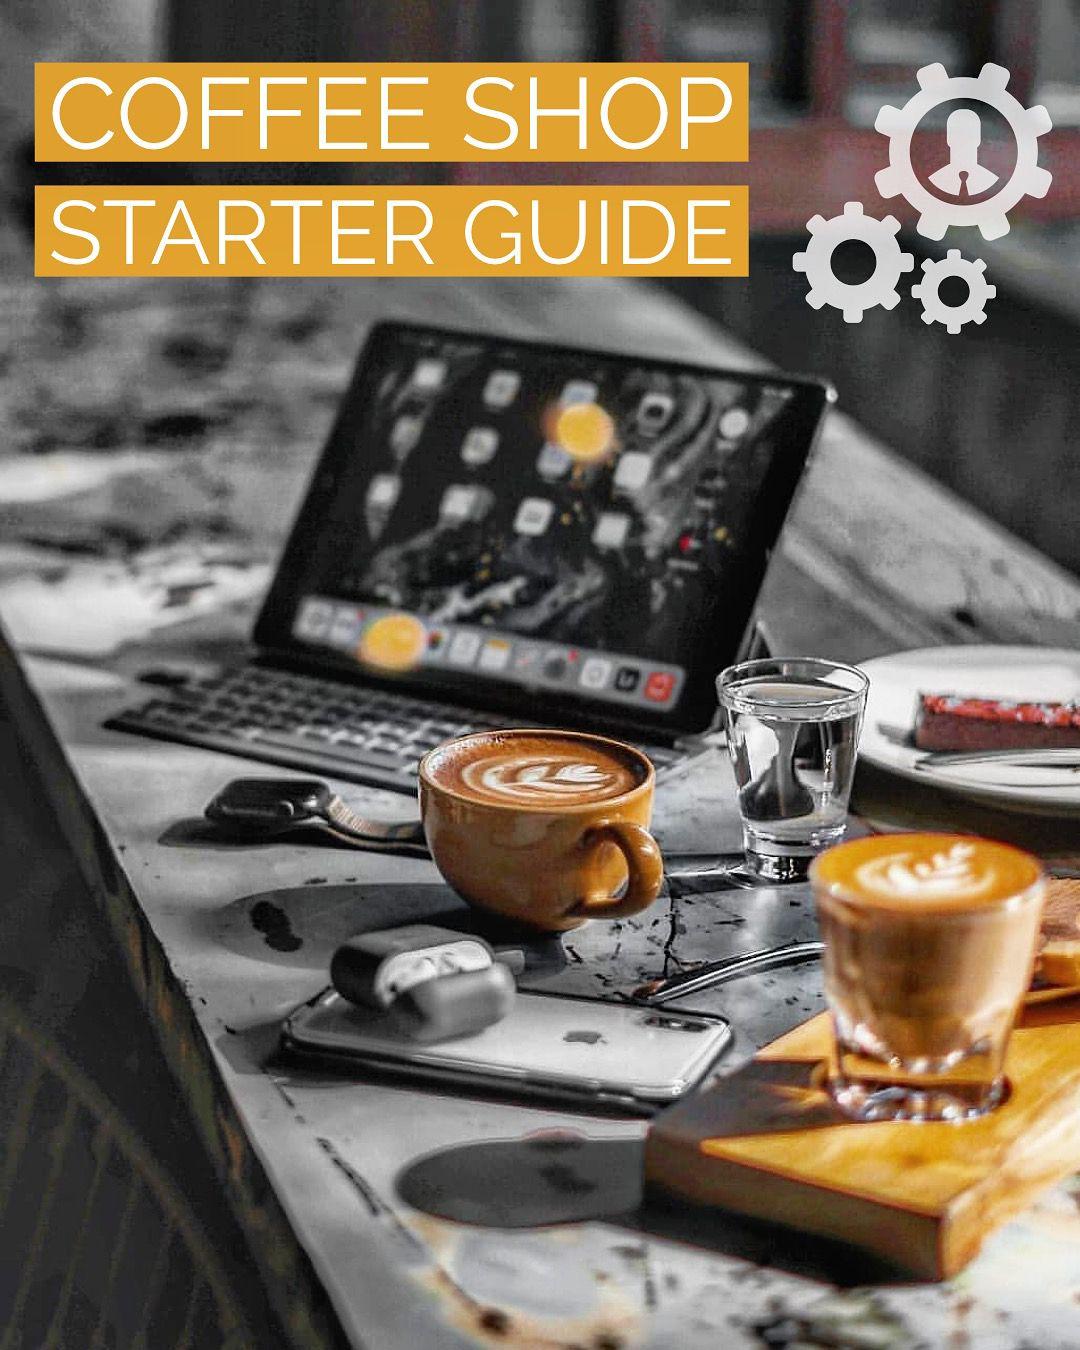 Coffee Shop Starter Guide Coffee Shop Photography Coffee Shop Coffee